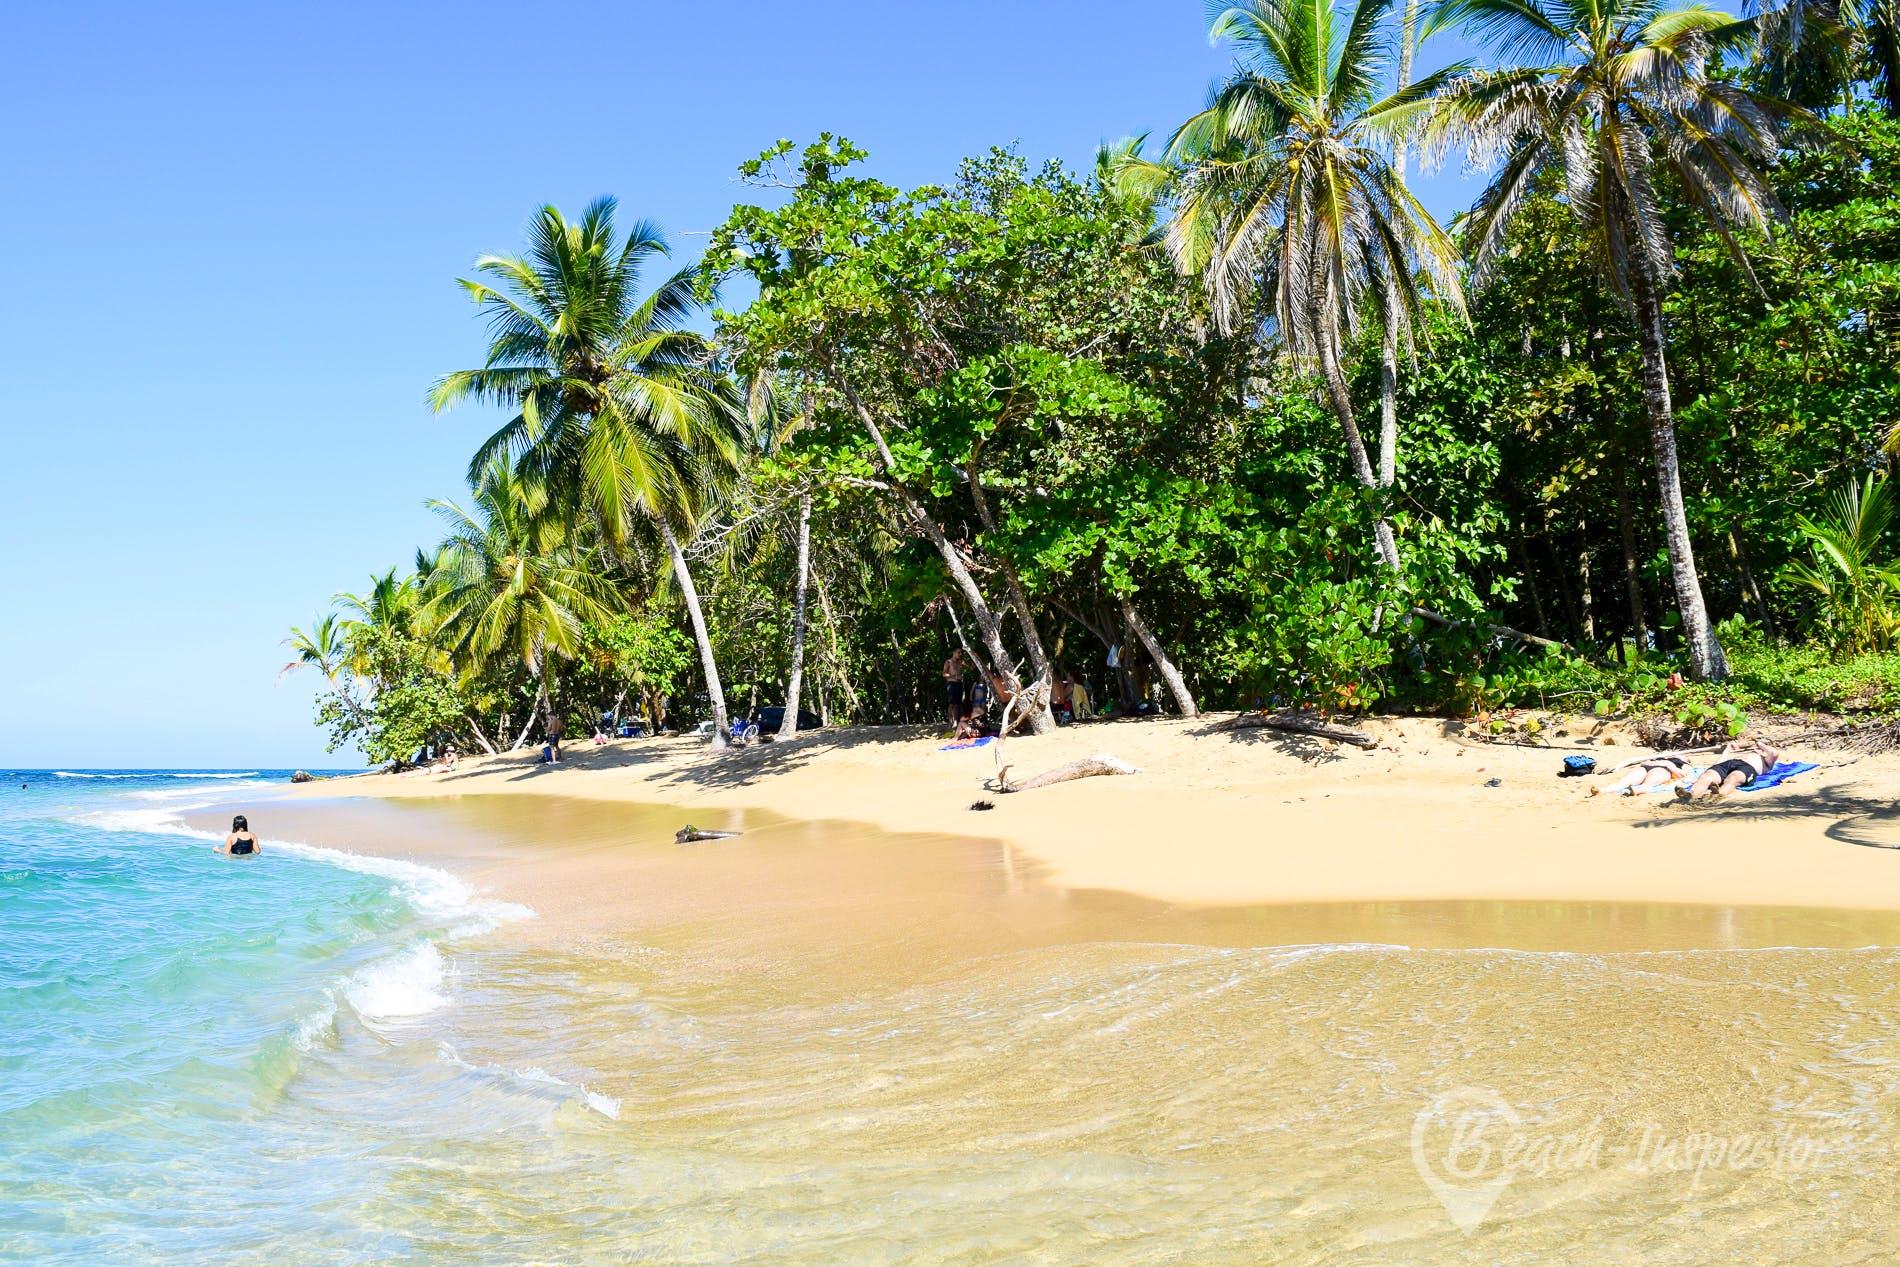 Strand Playa Punta Uva, Costa Rica, Costa Rica